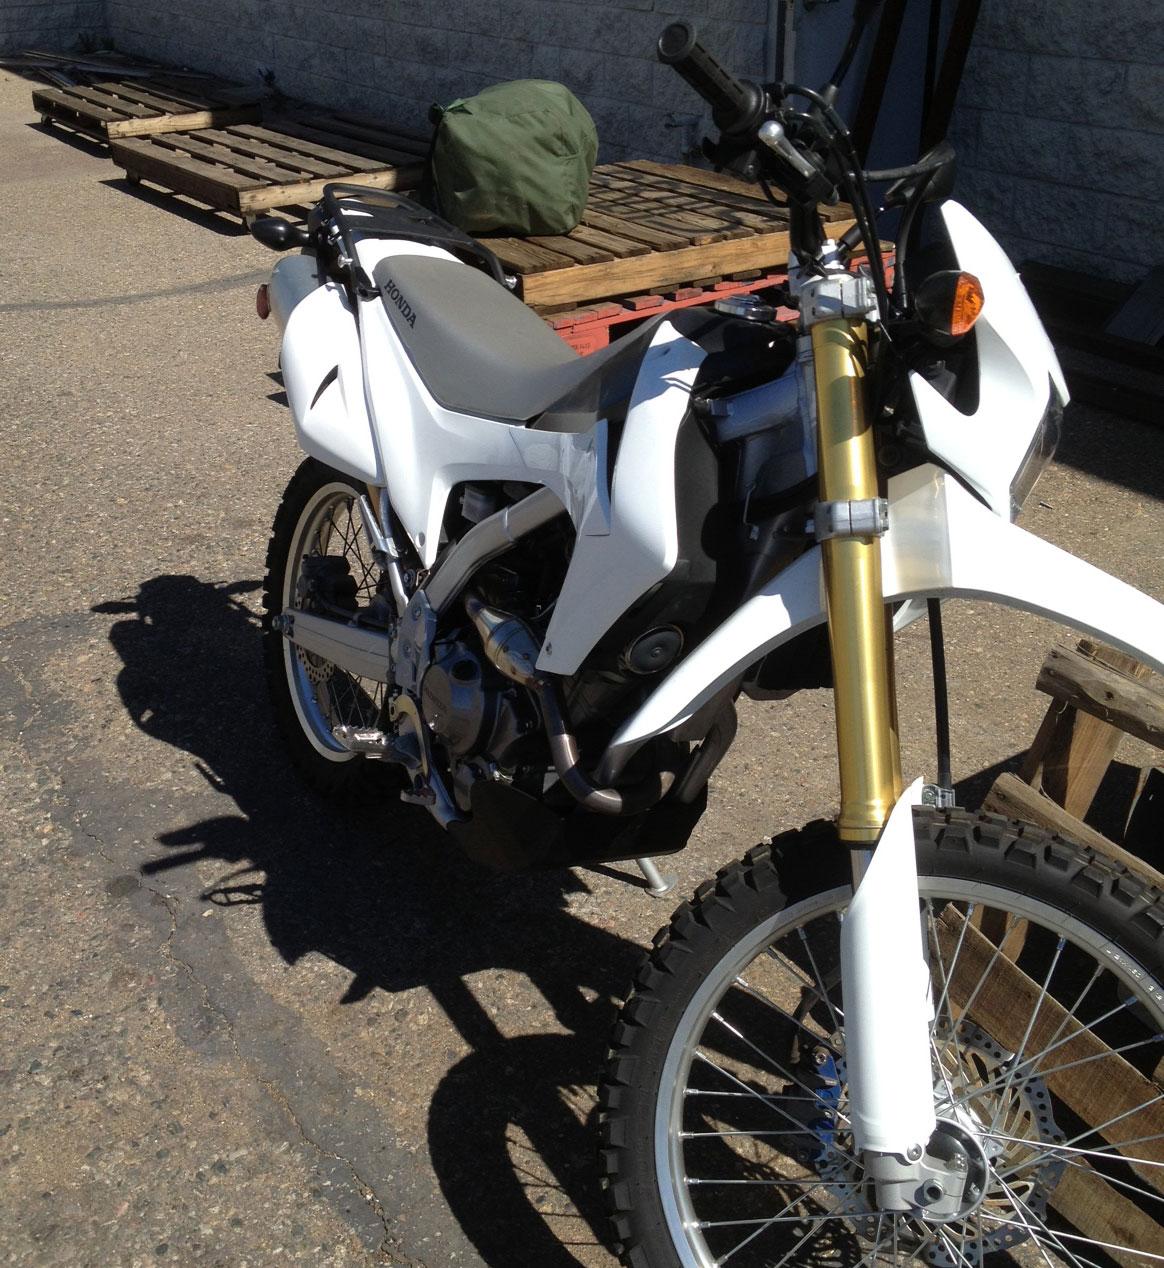 honda crfl project bike adventure motorcycling handbook